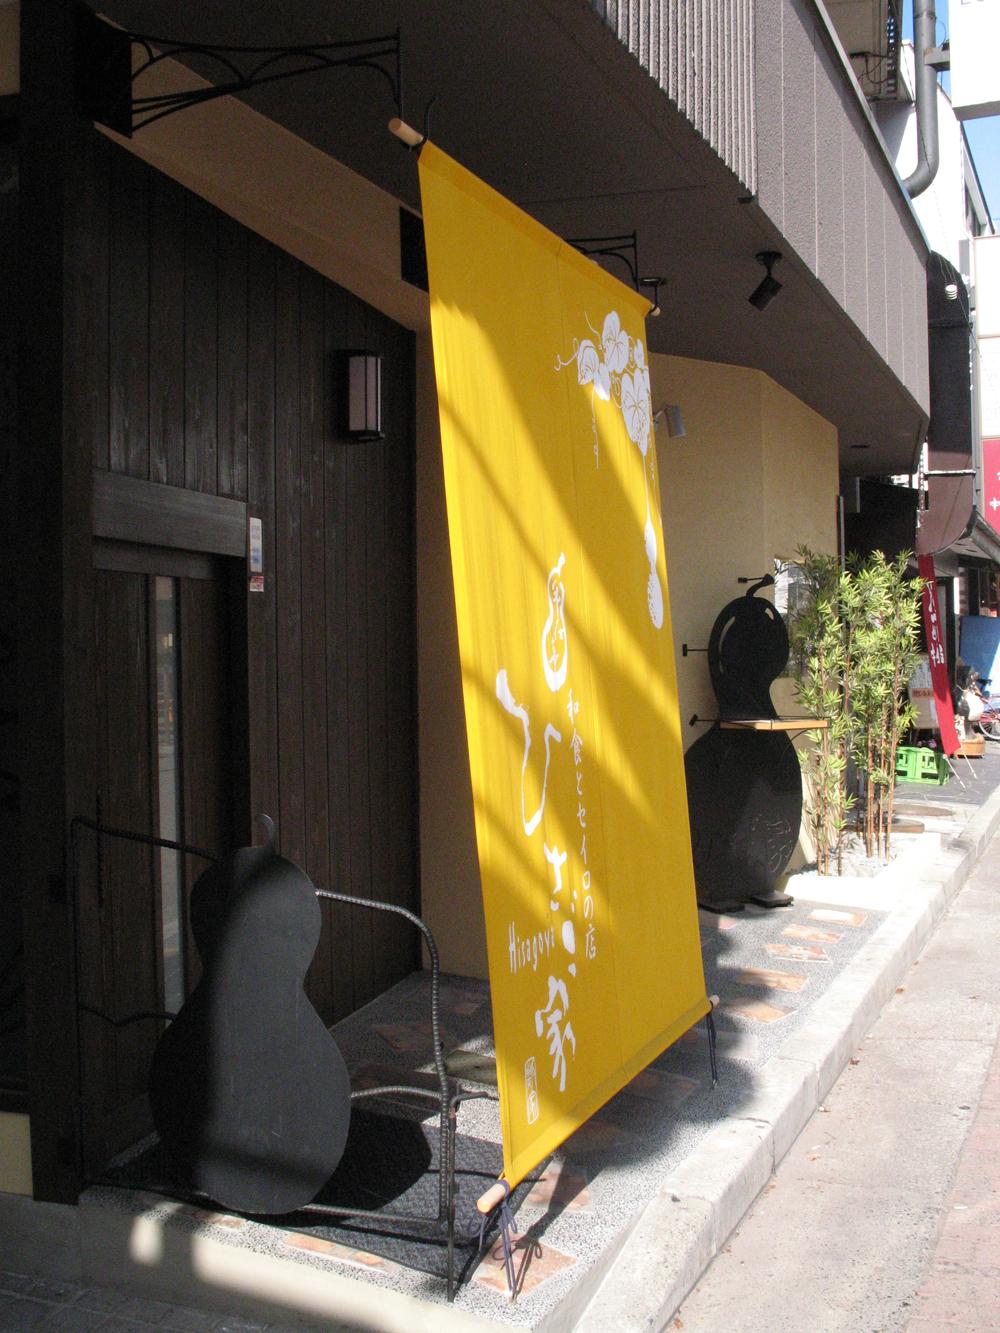 Restaurant banner in Matsumoto City, Japan